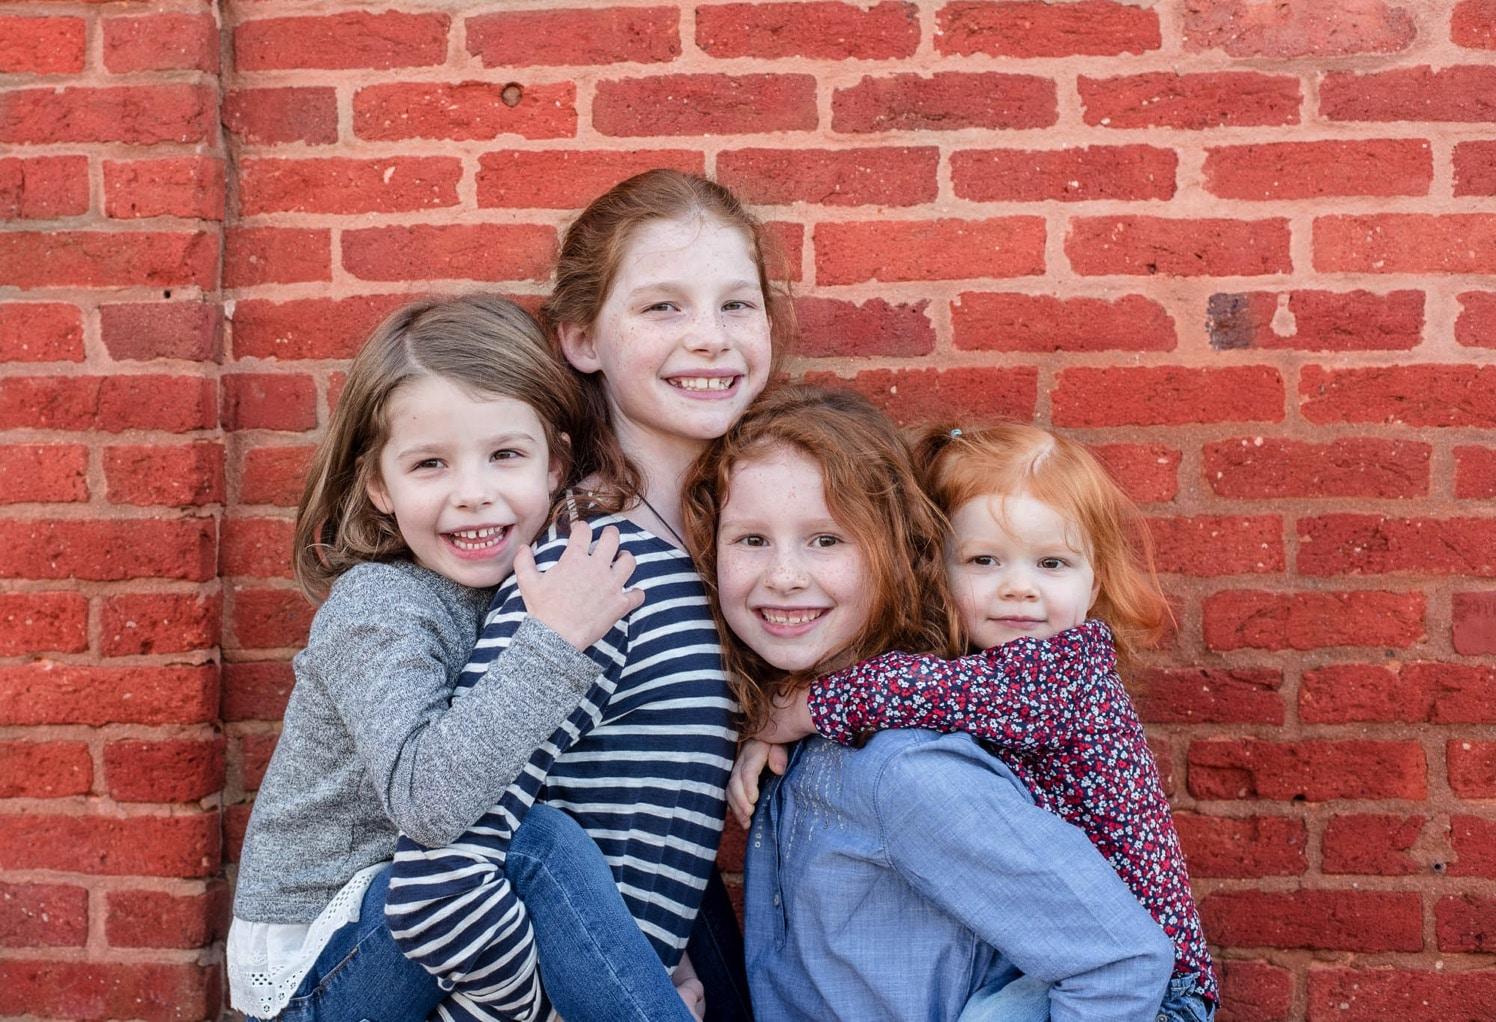 oshkosh for girls family picture